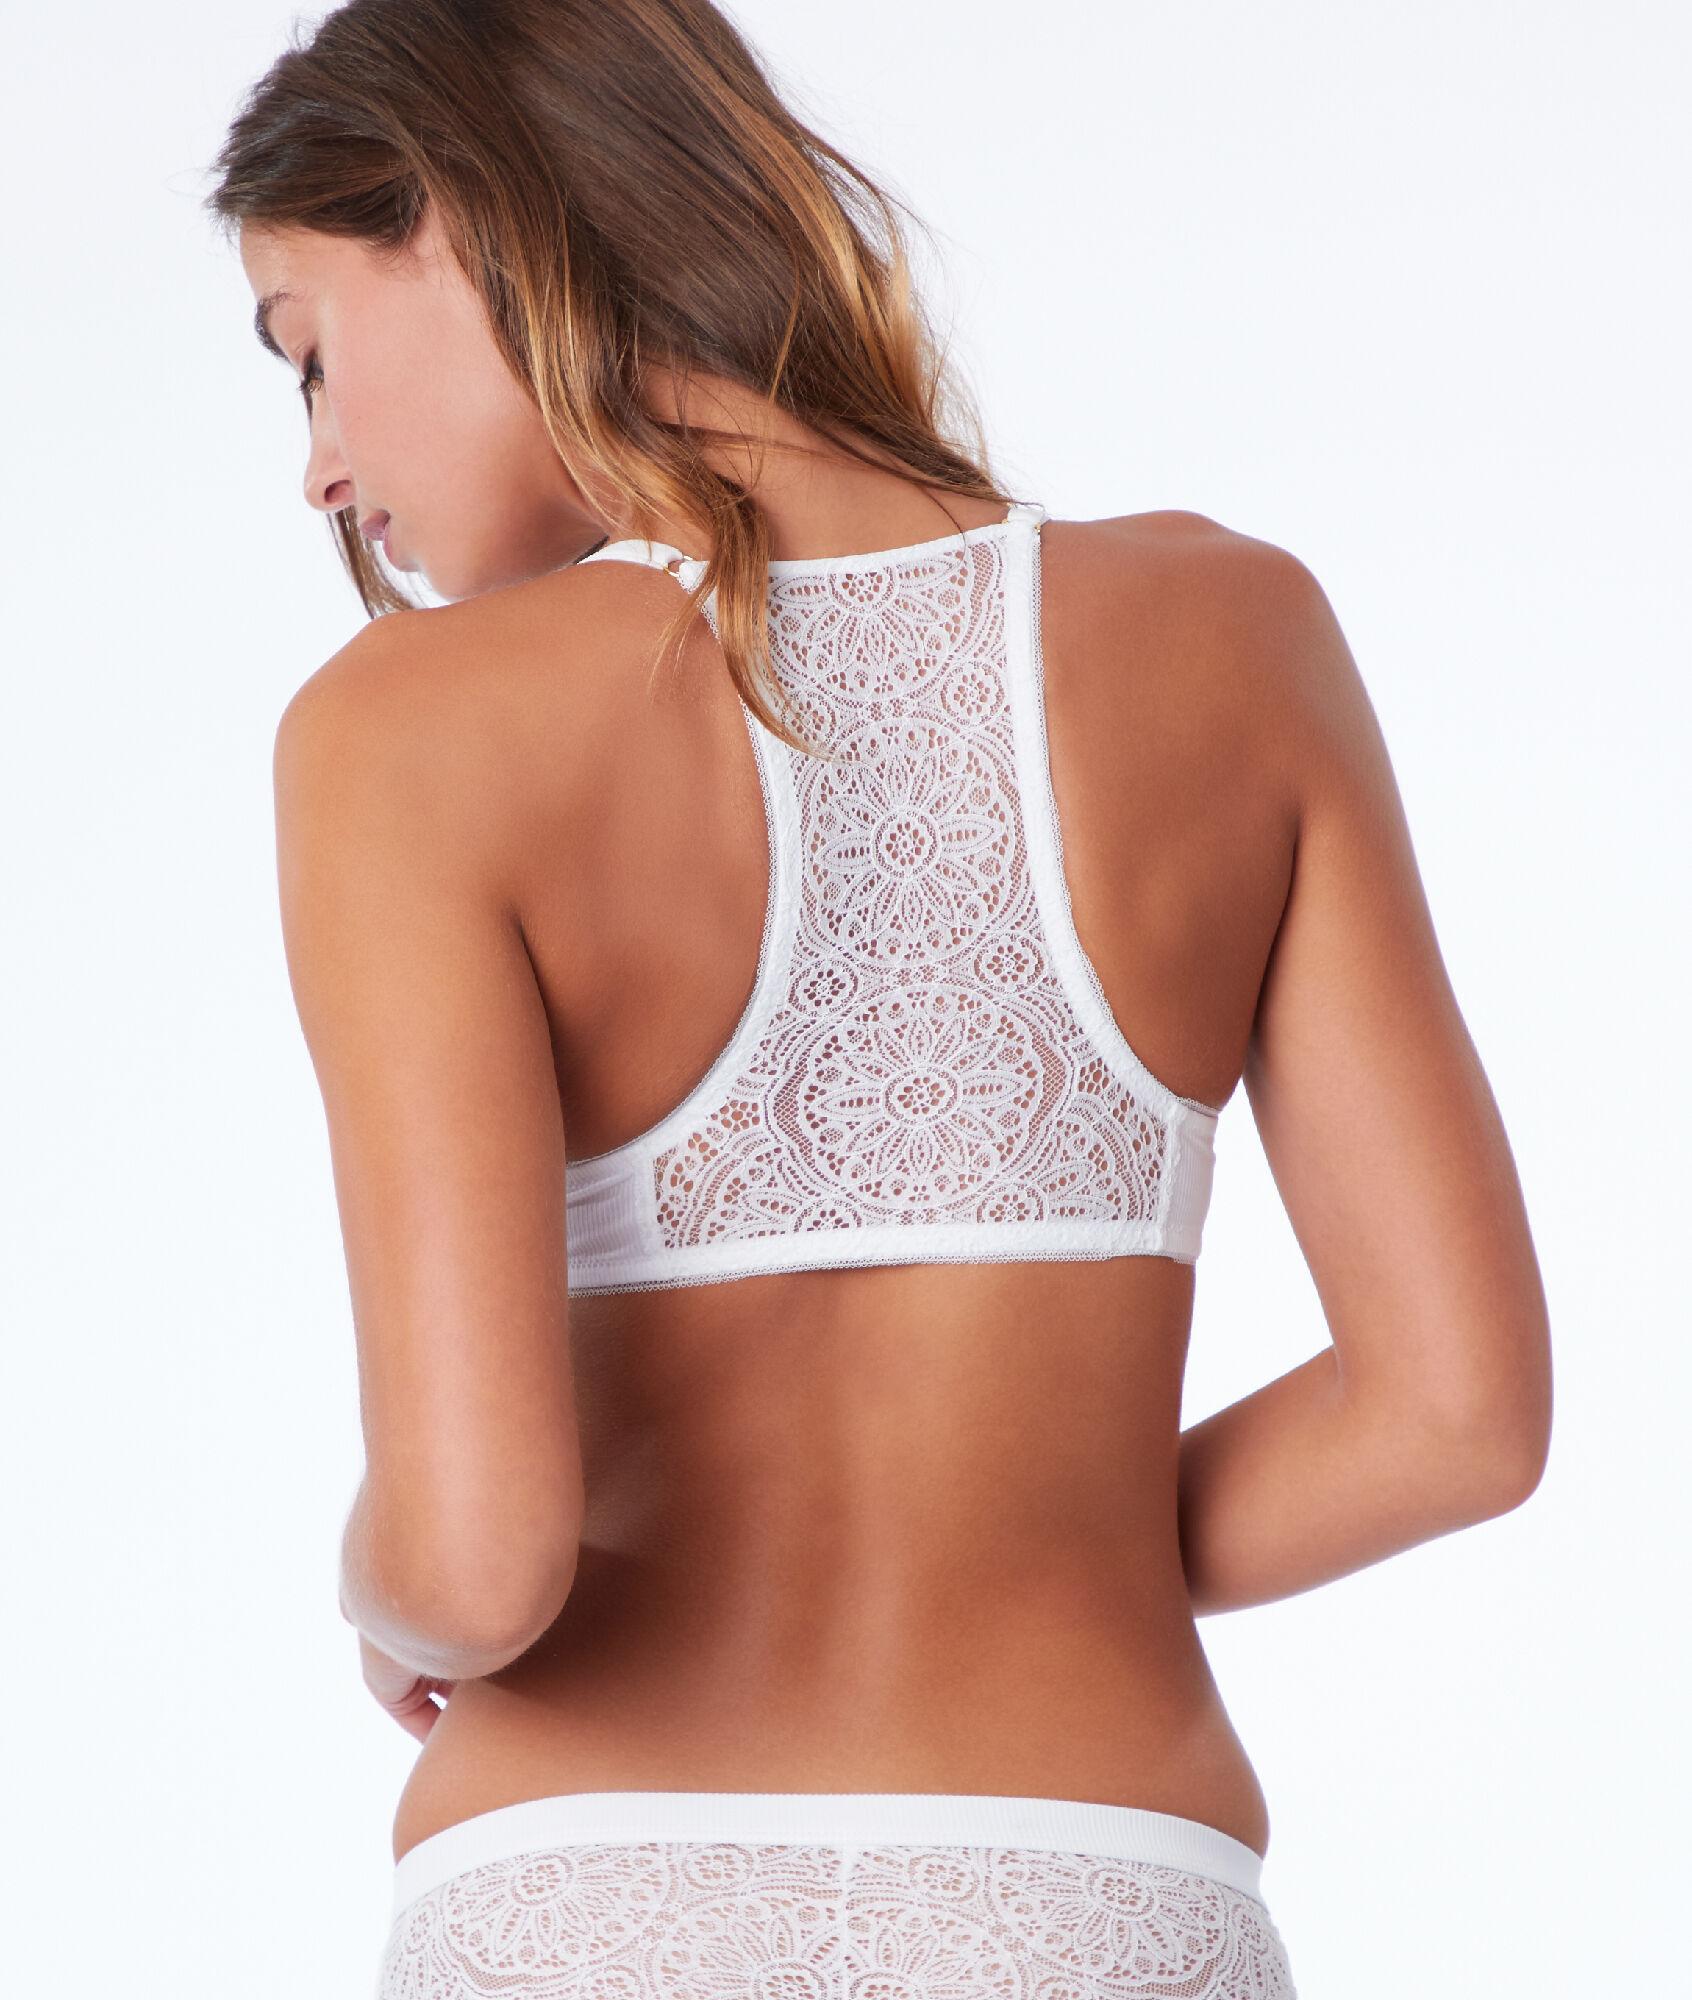 25bbf4310ebef Bra n°5 - classic padded lace bra